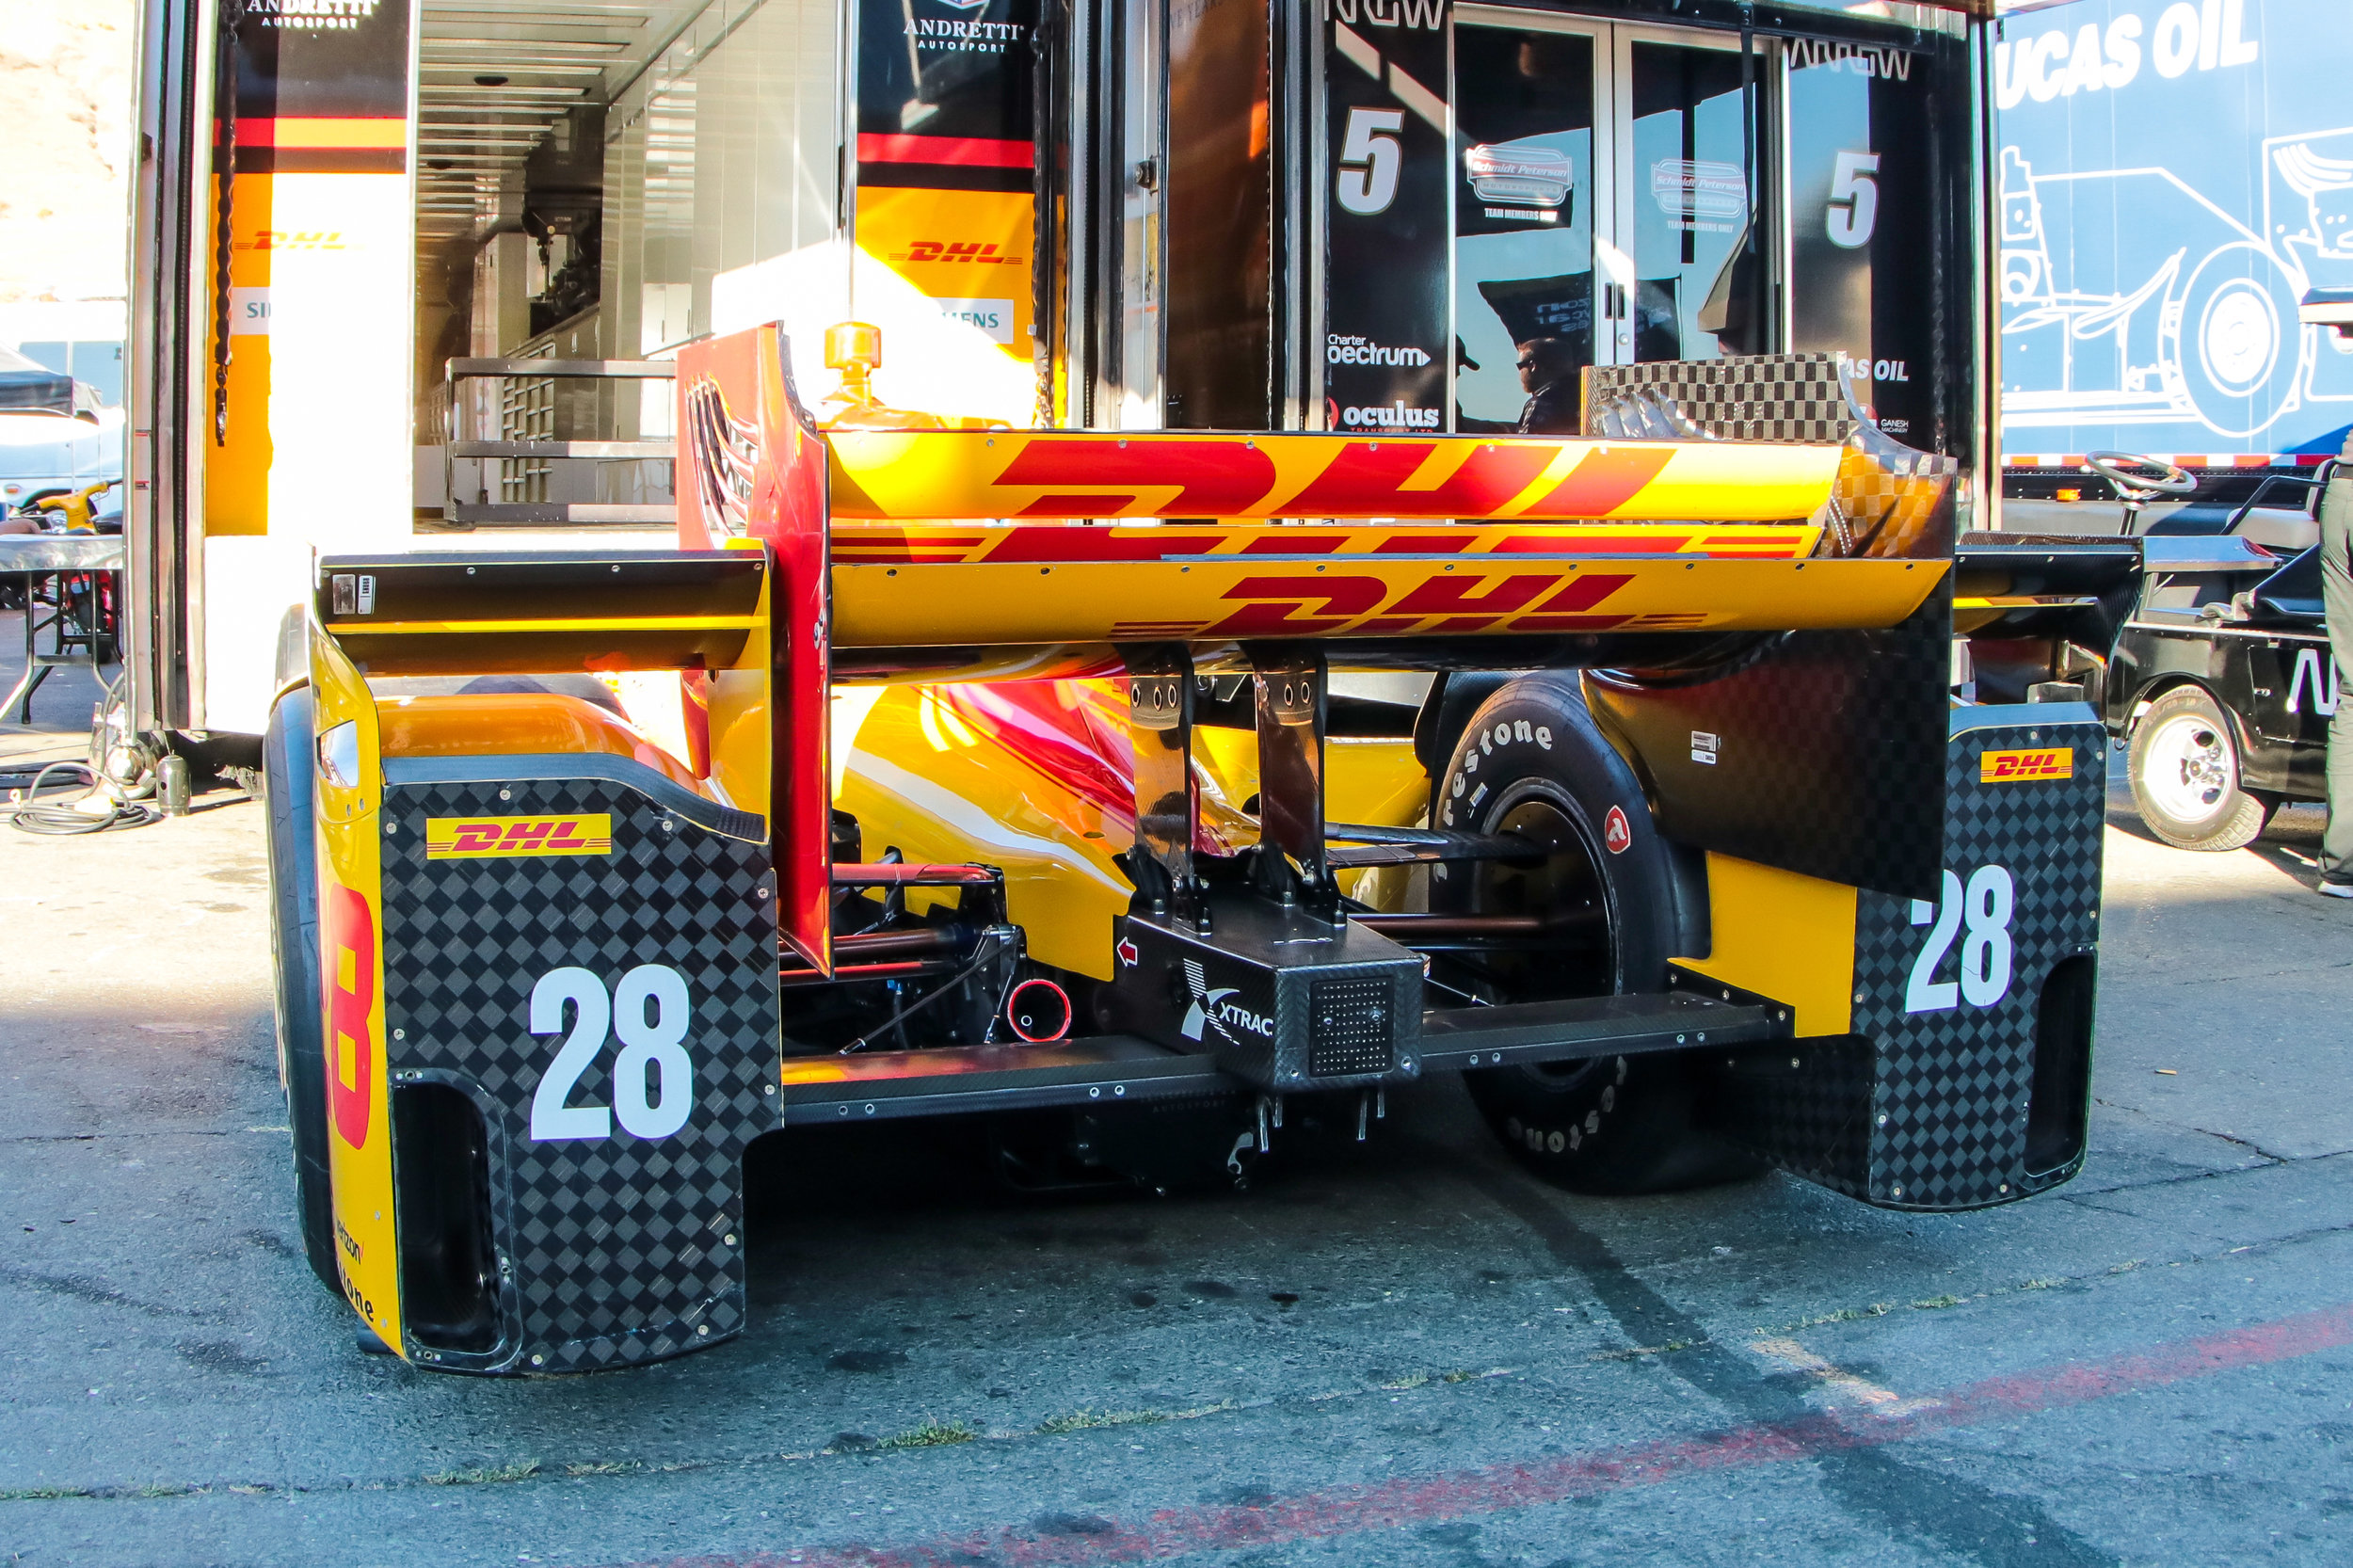 Indy16-2604.jpg